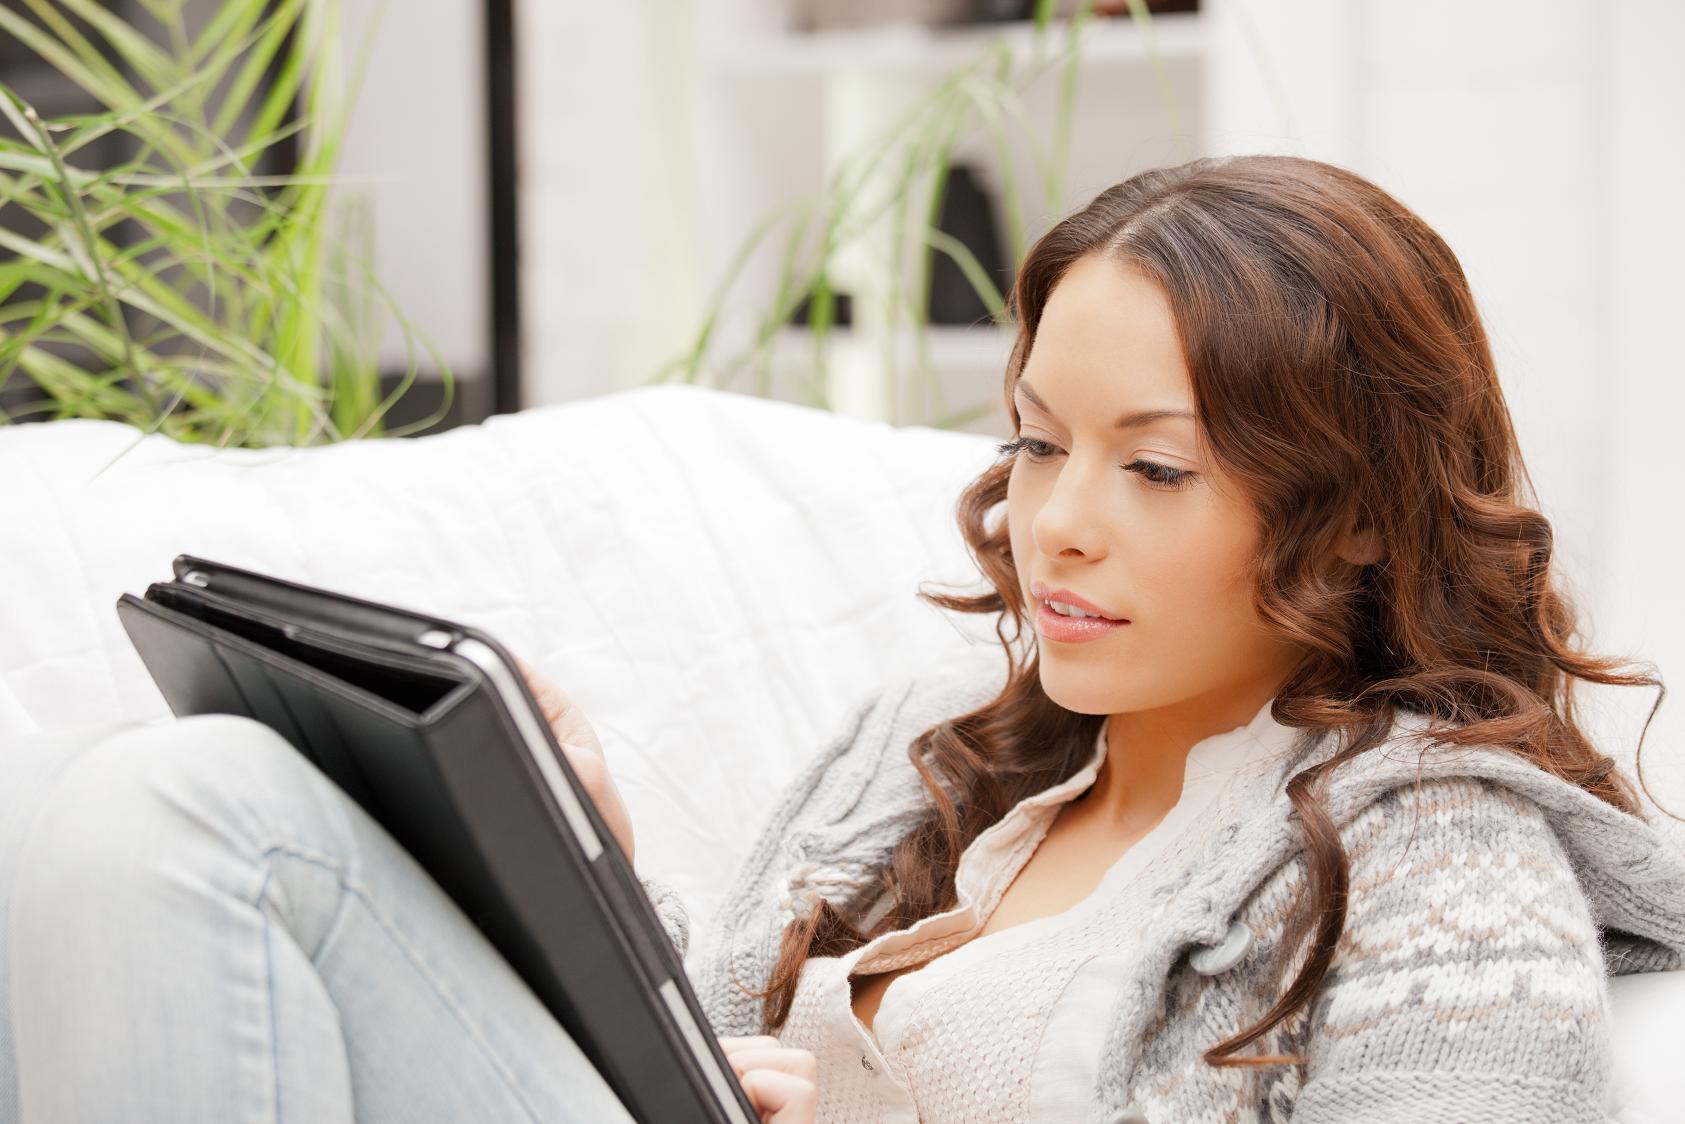 Using Information-Based Websites to Drive Enrollments